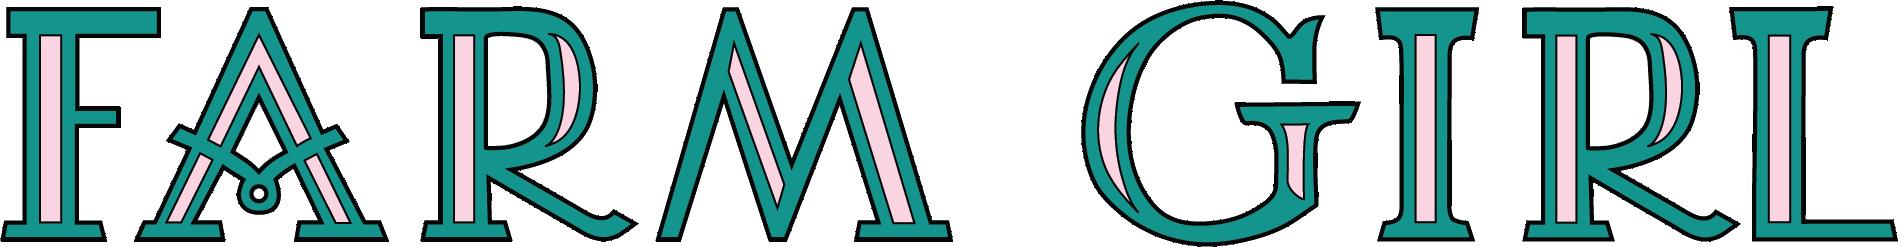 farm-girl-logo.png